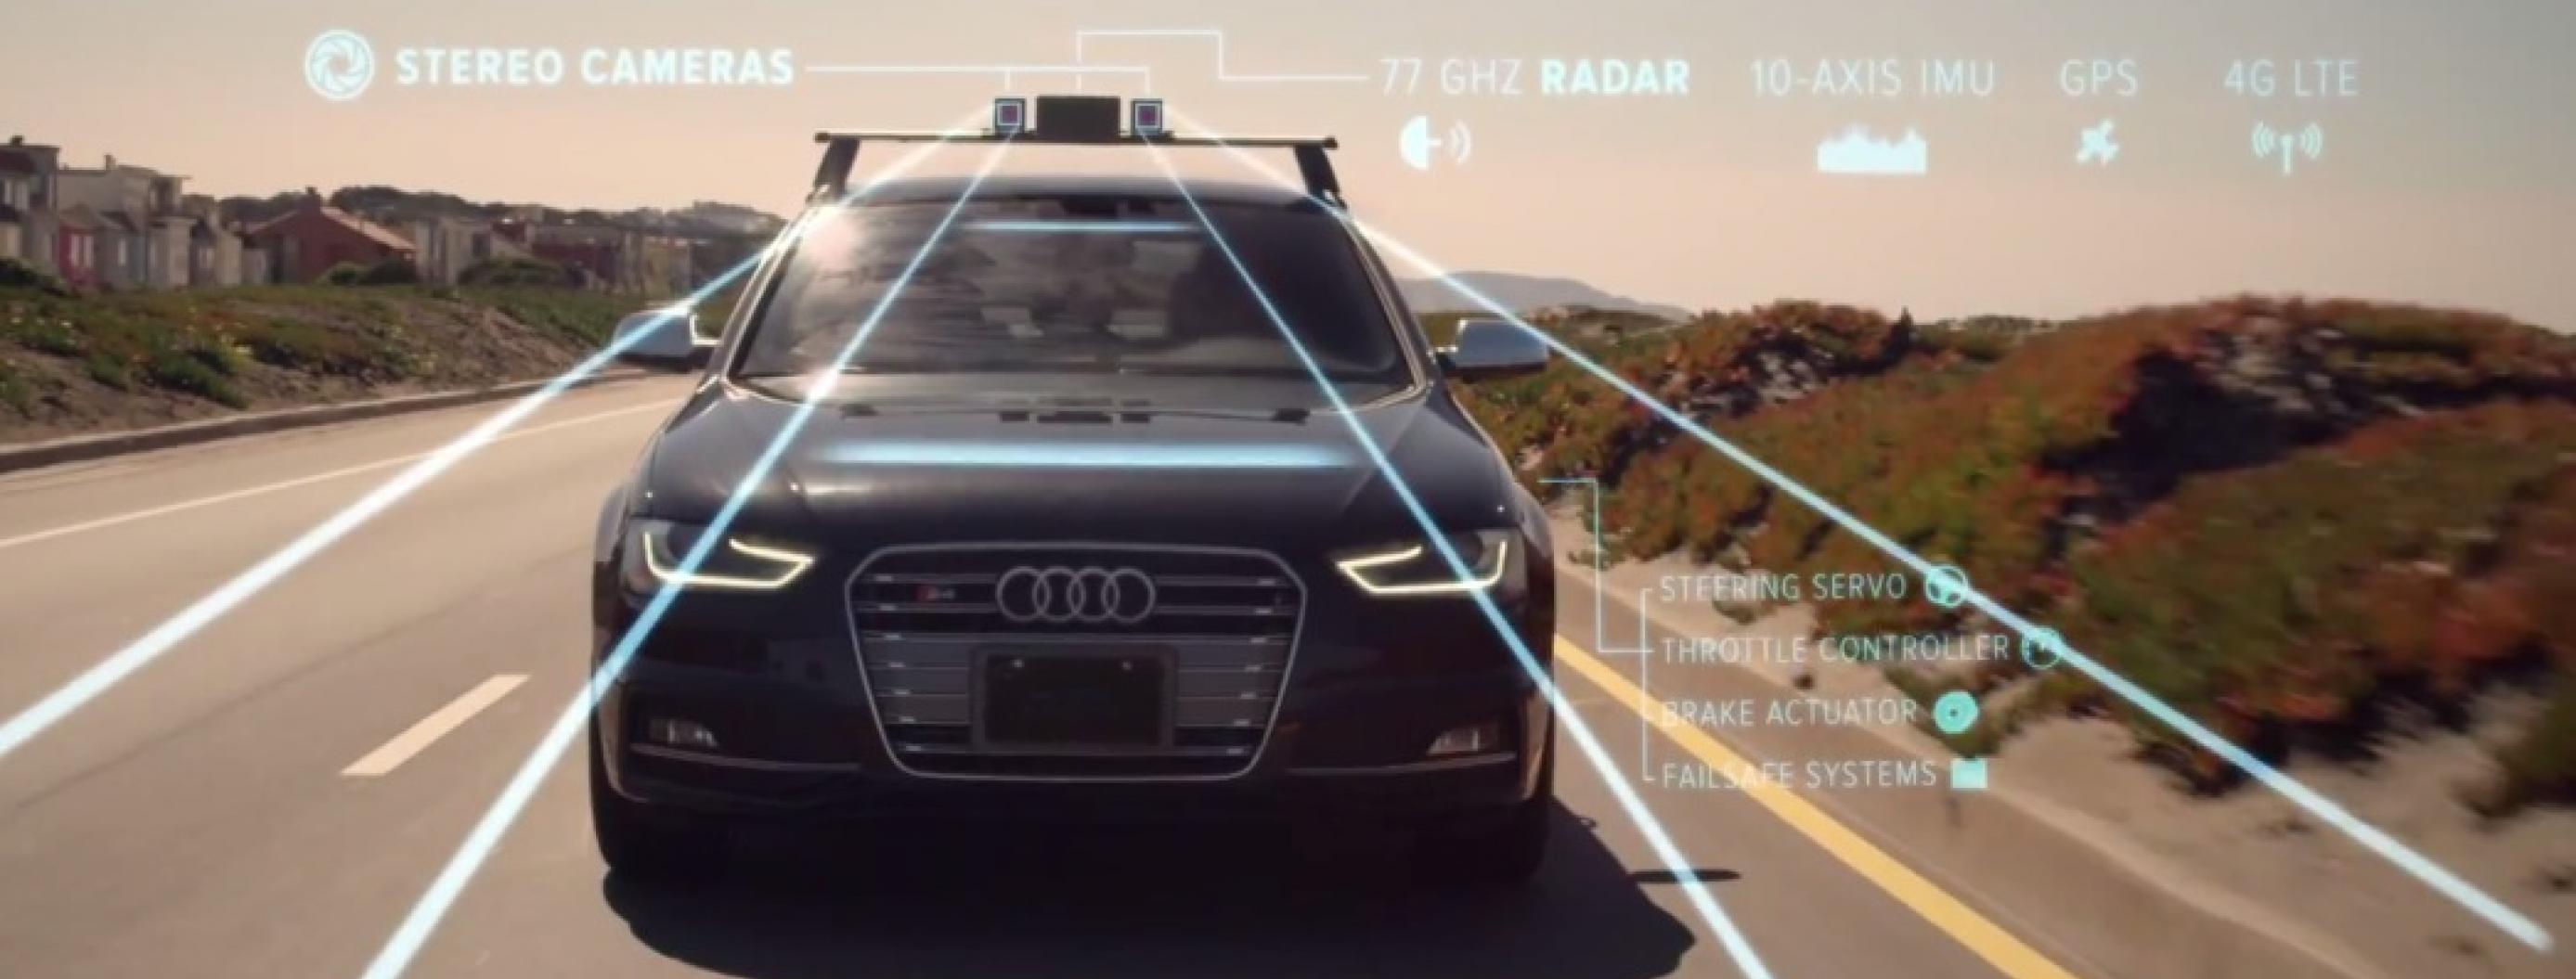 Watch a Self-driving Car Take a Night Ride